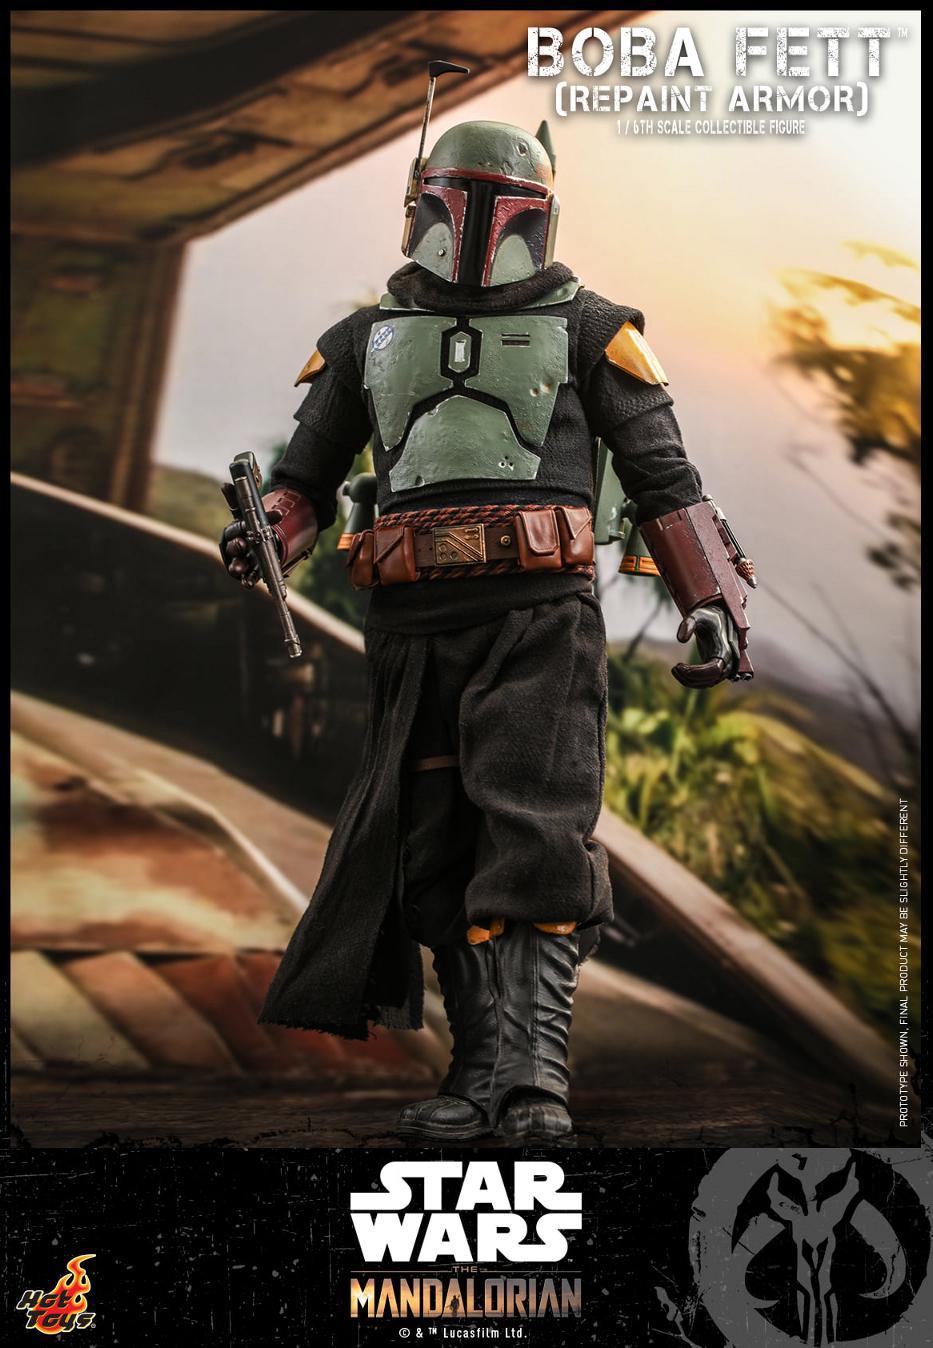 Boba Fett (Repaint Armor) Collectible Figure - Hot Toys Boba_f66